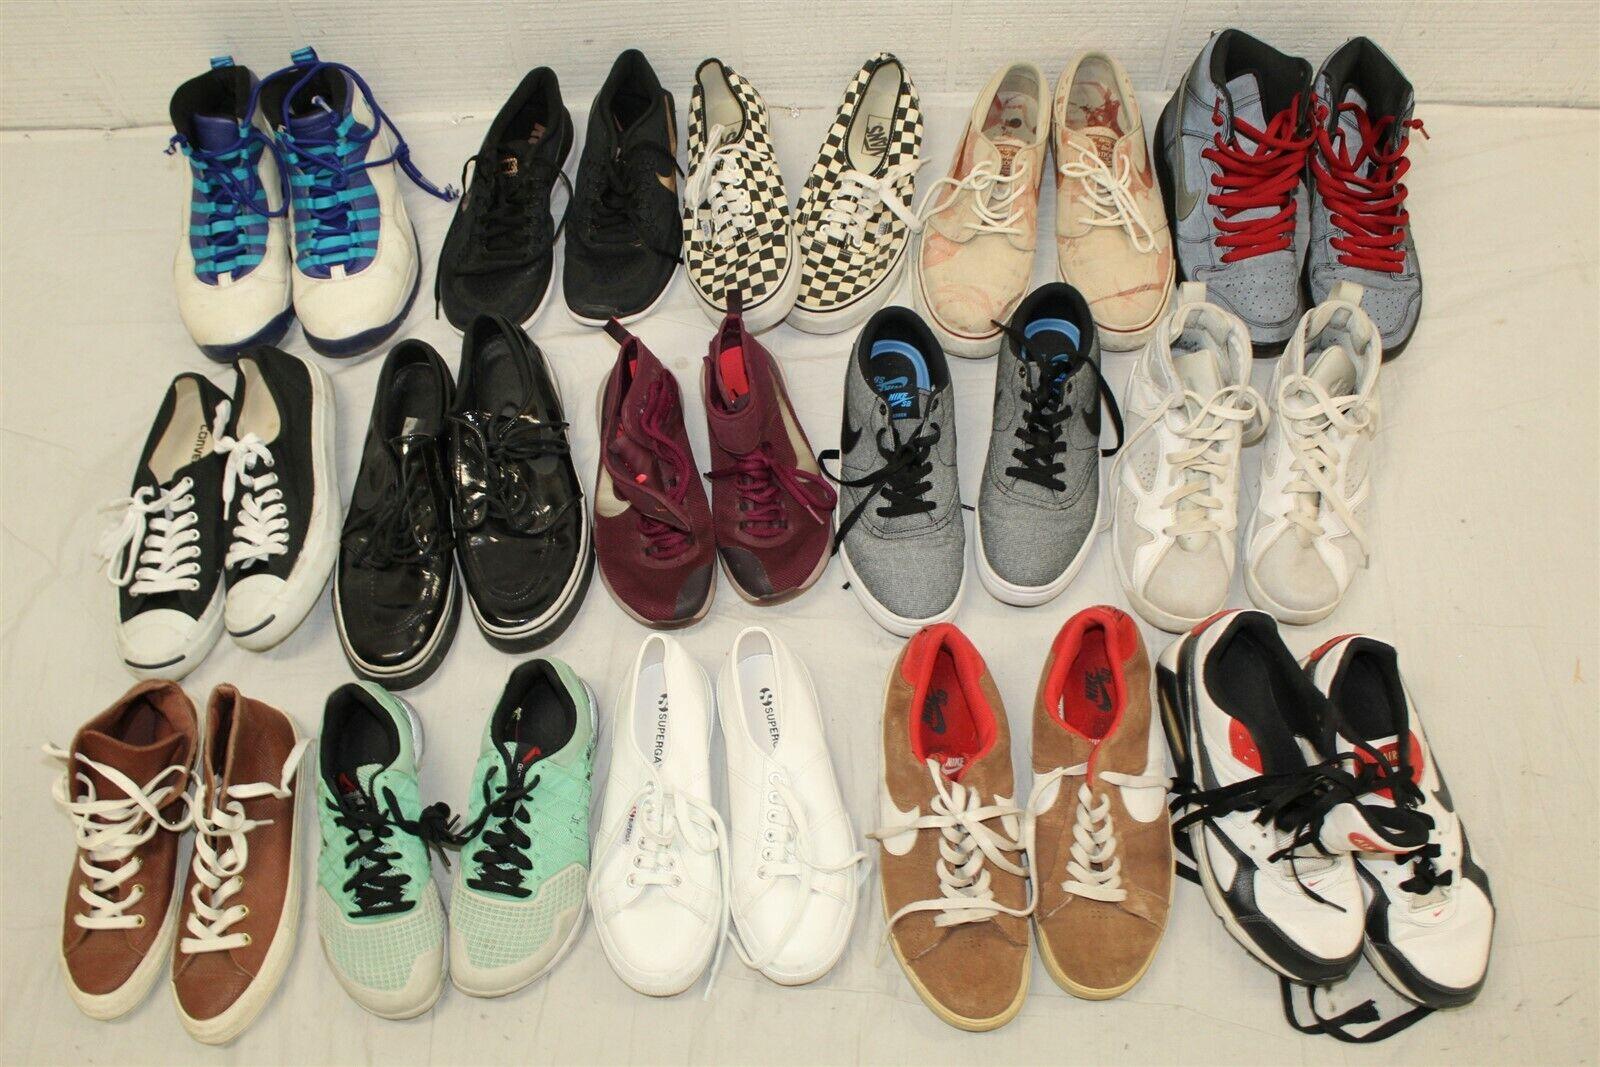 Sport Shoes Lot Wholesale Used Rehab Resale 26 POUNDS! Nike Vans Collection